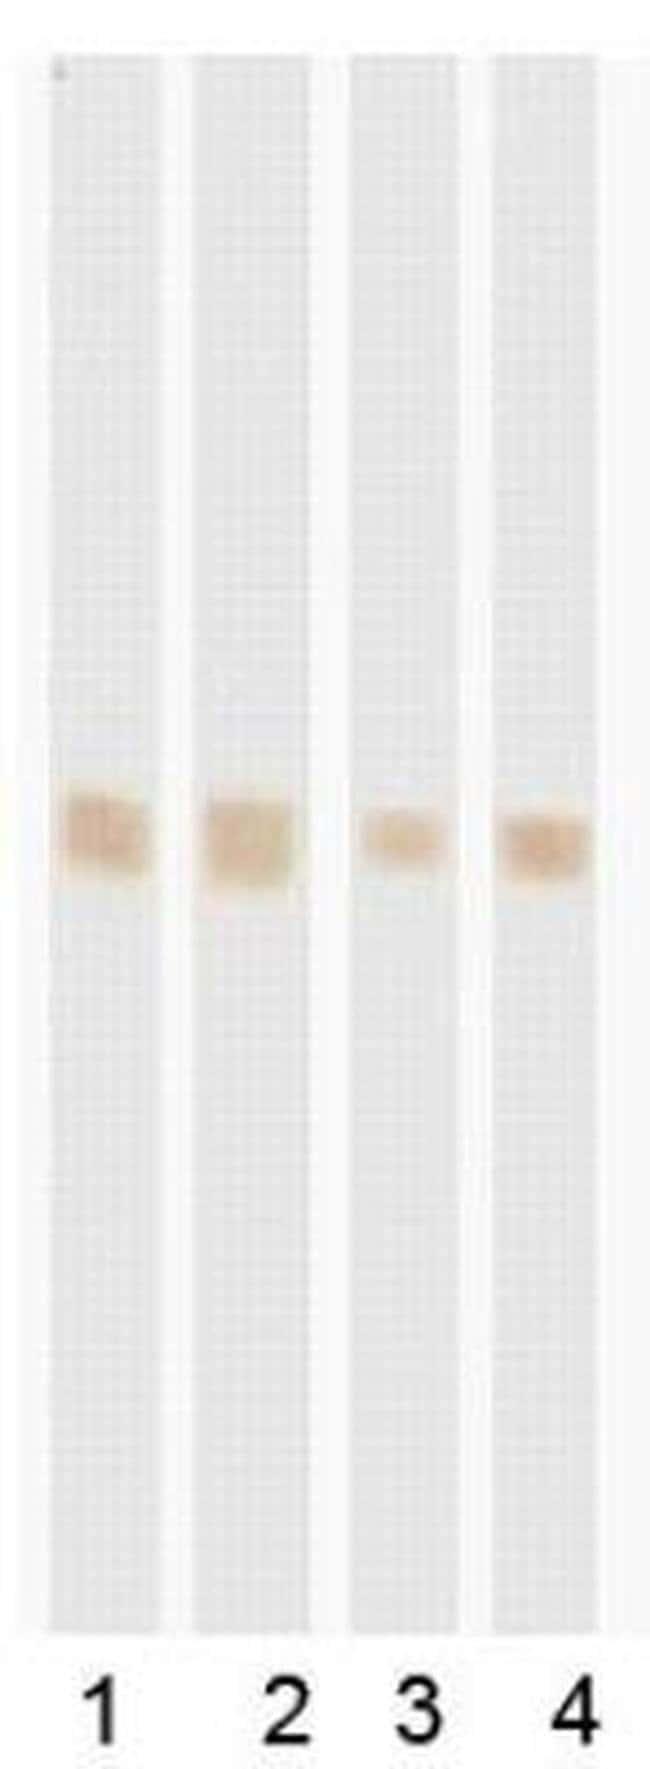 POLR2D Mouse anti-Human, Clone: RB42, Invitrogen 200 µg; Unconjugated